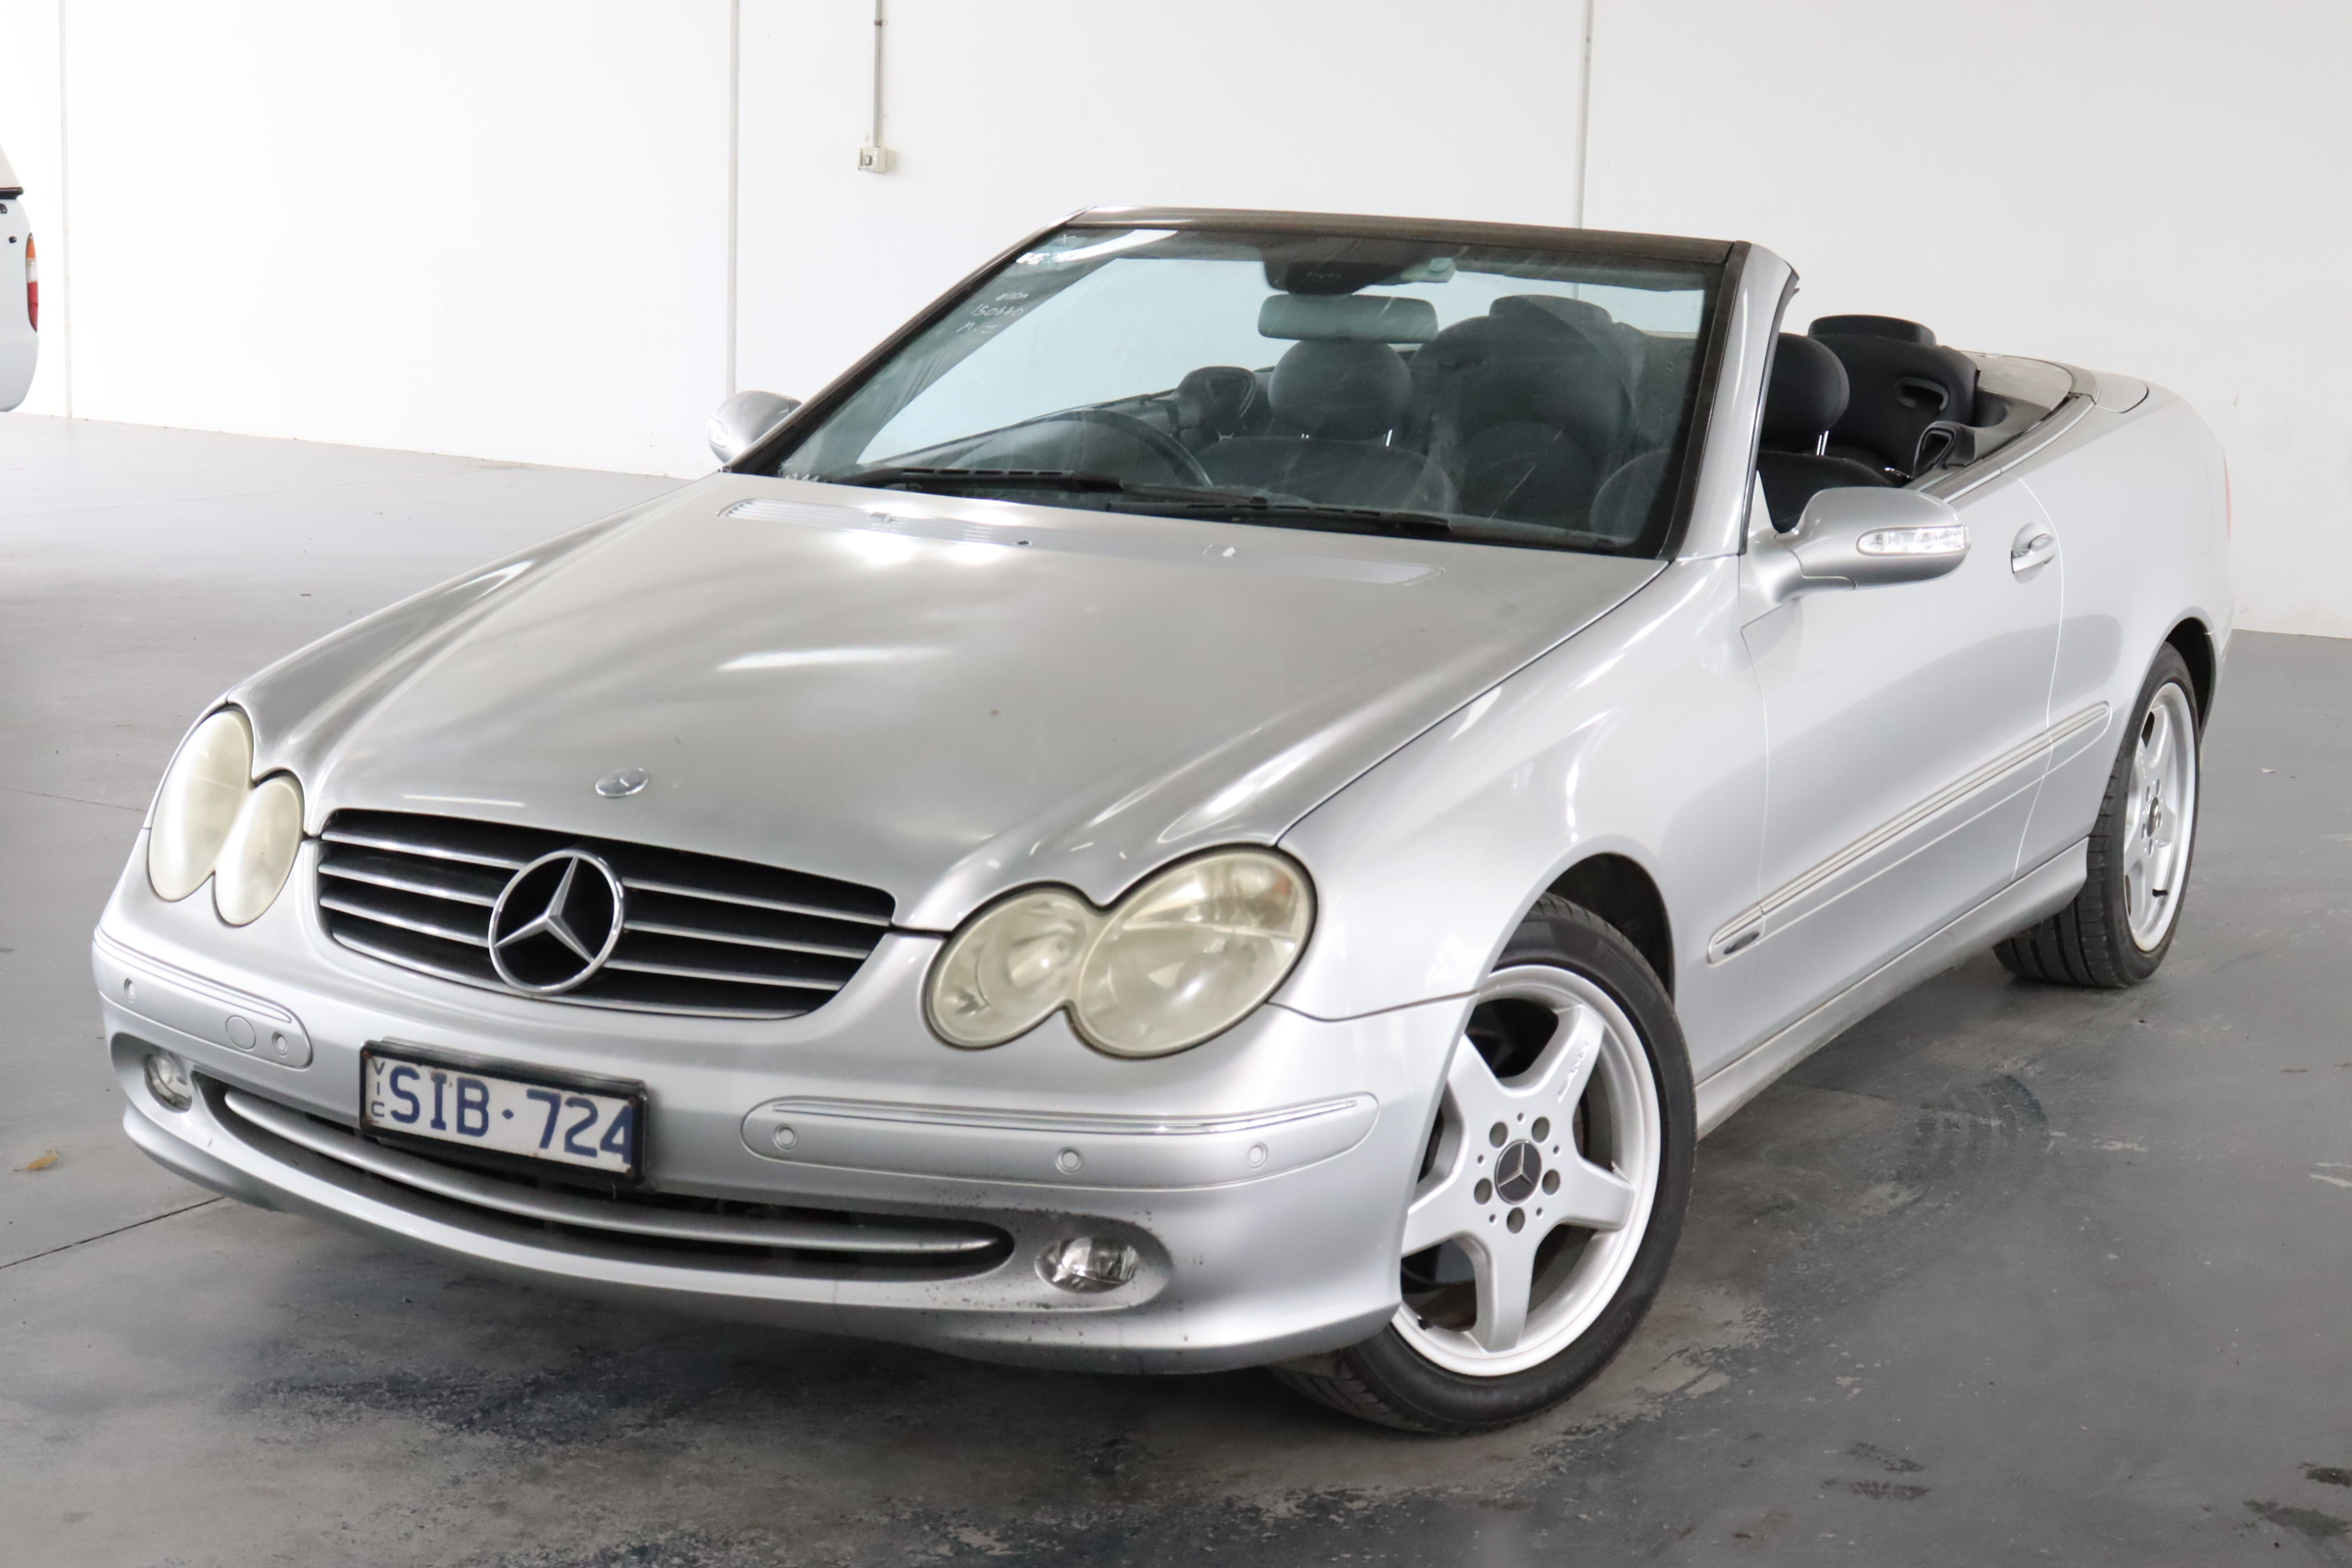 2003 Mercedes Benz CLK 320 Avantgarde A209 Automatic Convertible